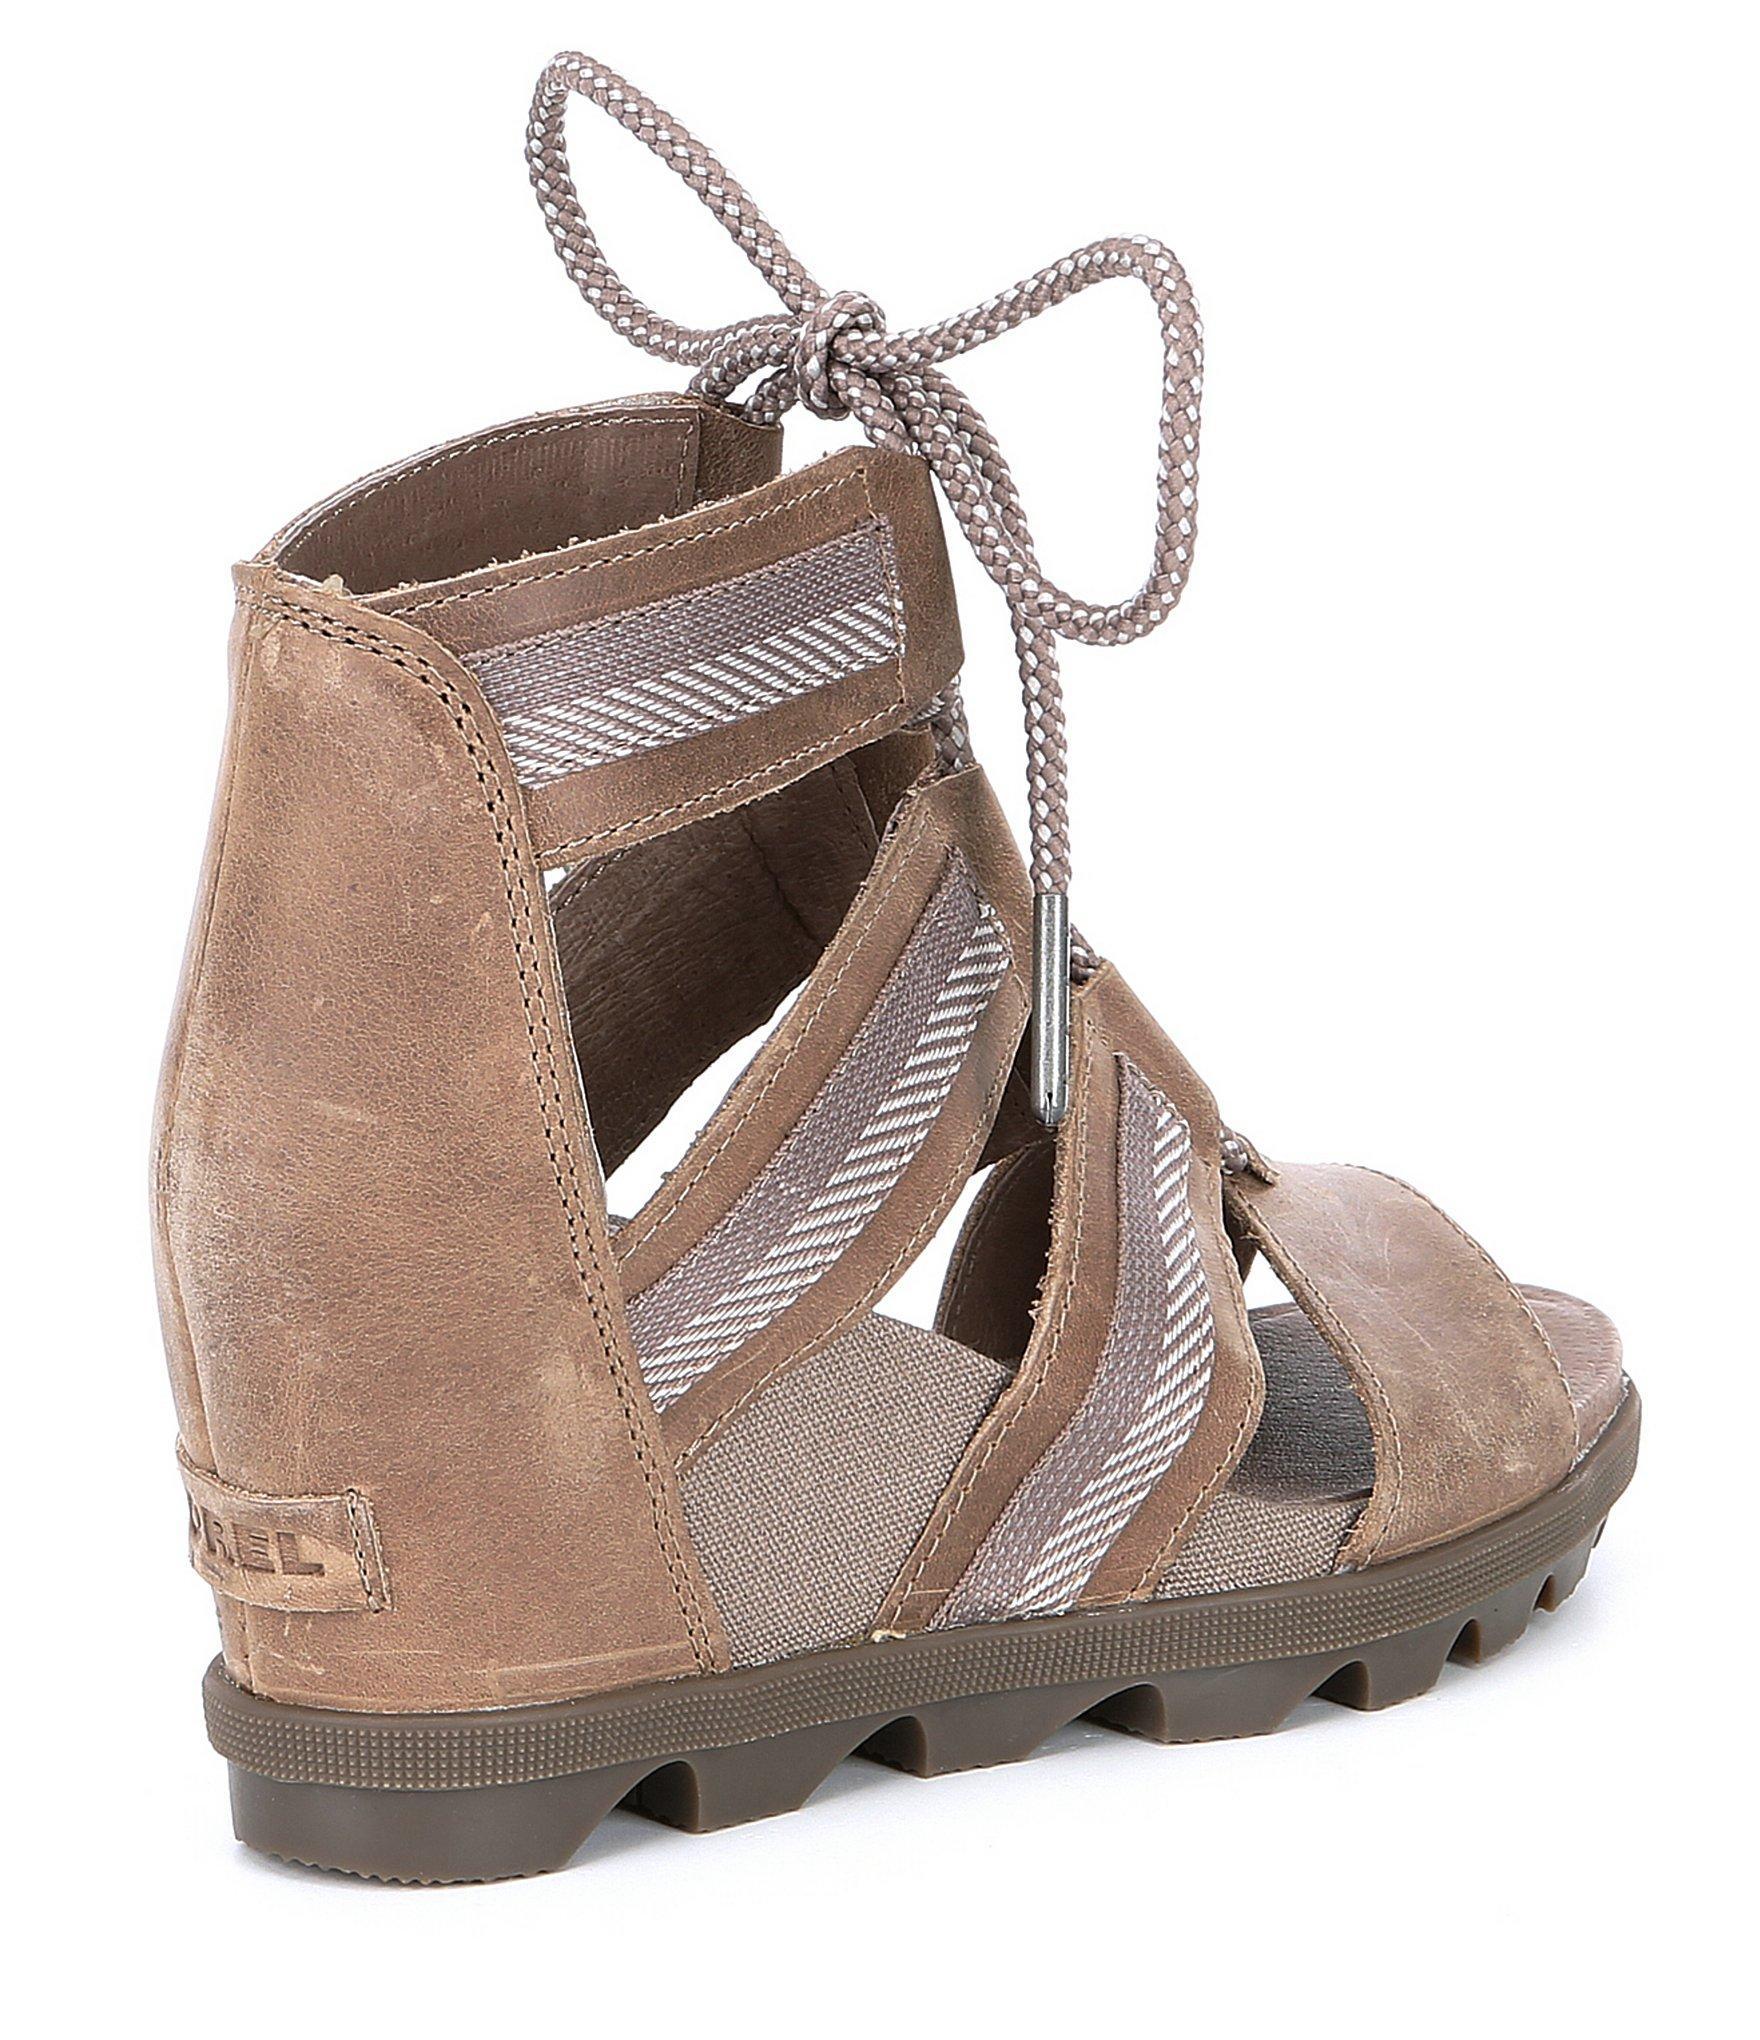 f28e86708 Sorel - Brown Joanie Ii Leather Lace Sandals - Lyst. View fullscreen